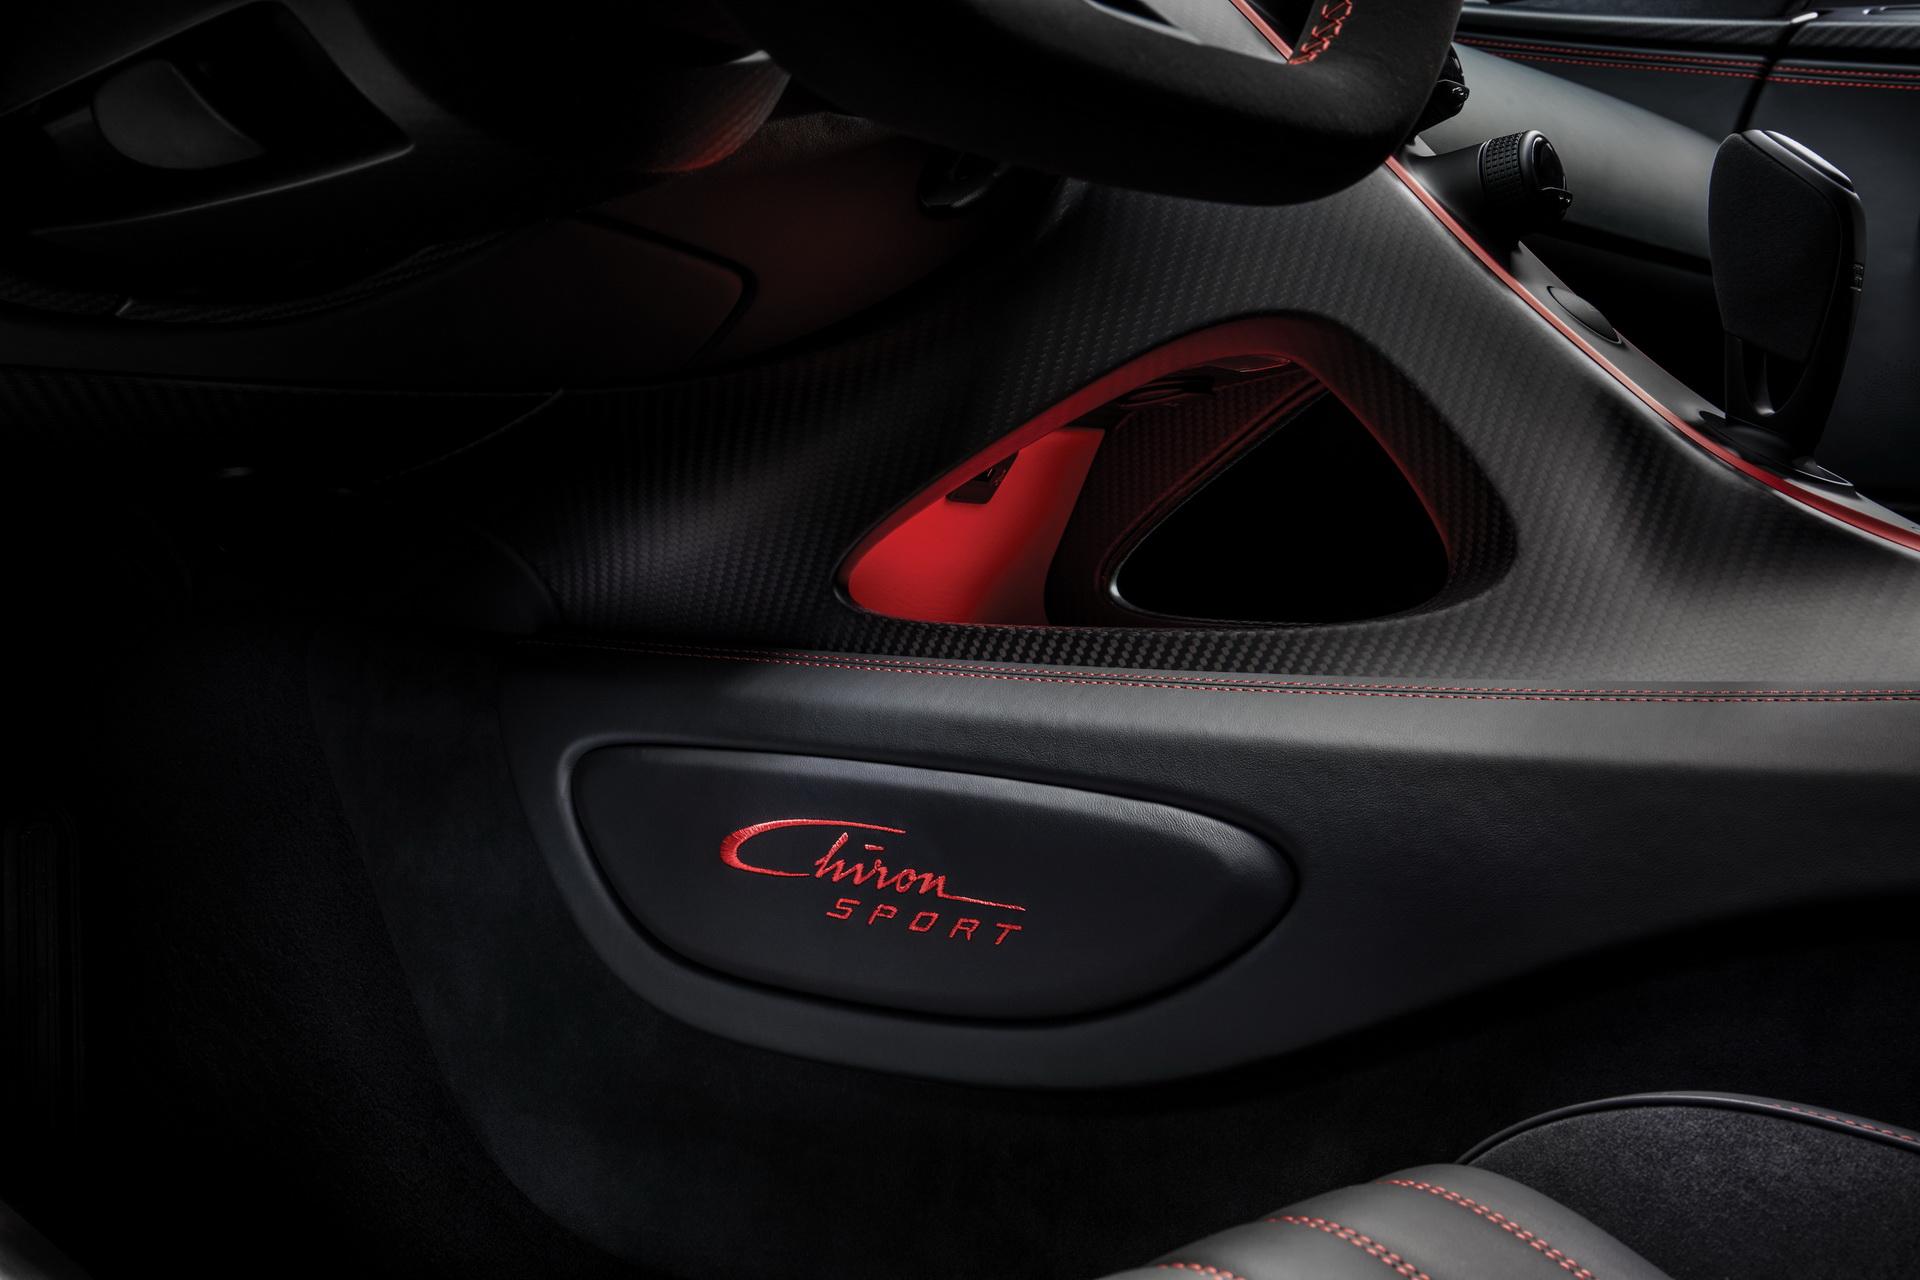 2018 bugatti chiron sport 16 carviser. Black Bedroom Furniture Sets. Home Design Ideas